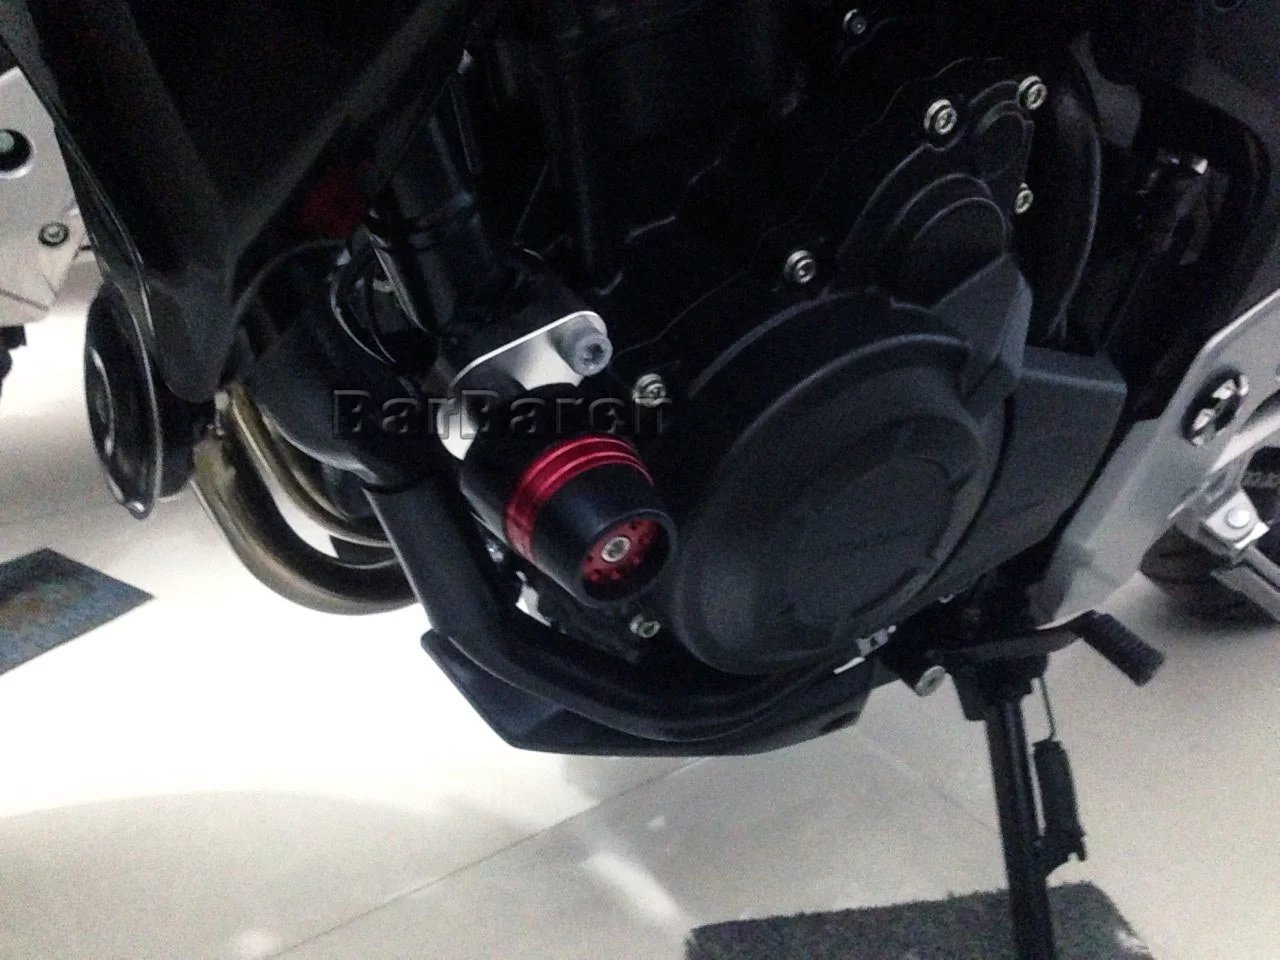 Frame Sliders Crash Protector For Honda CB500F 2013-2018 CB500X 2013-2018